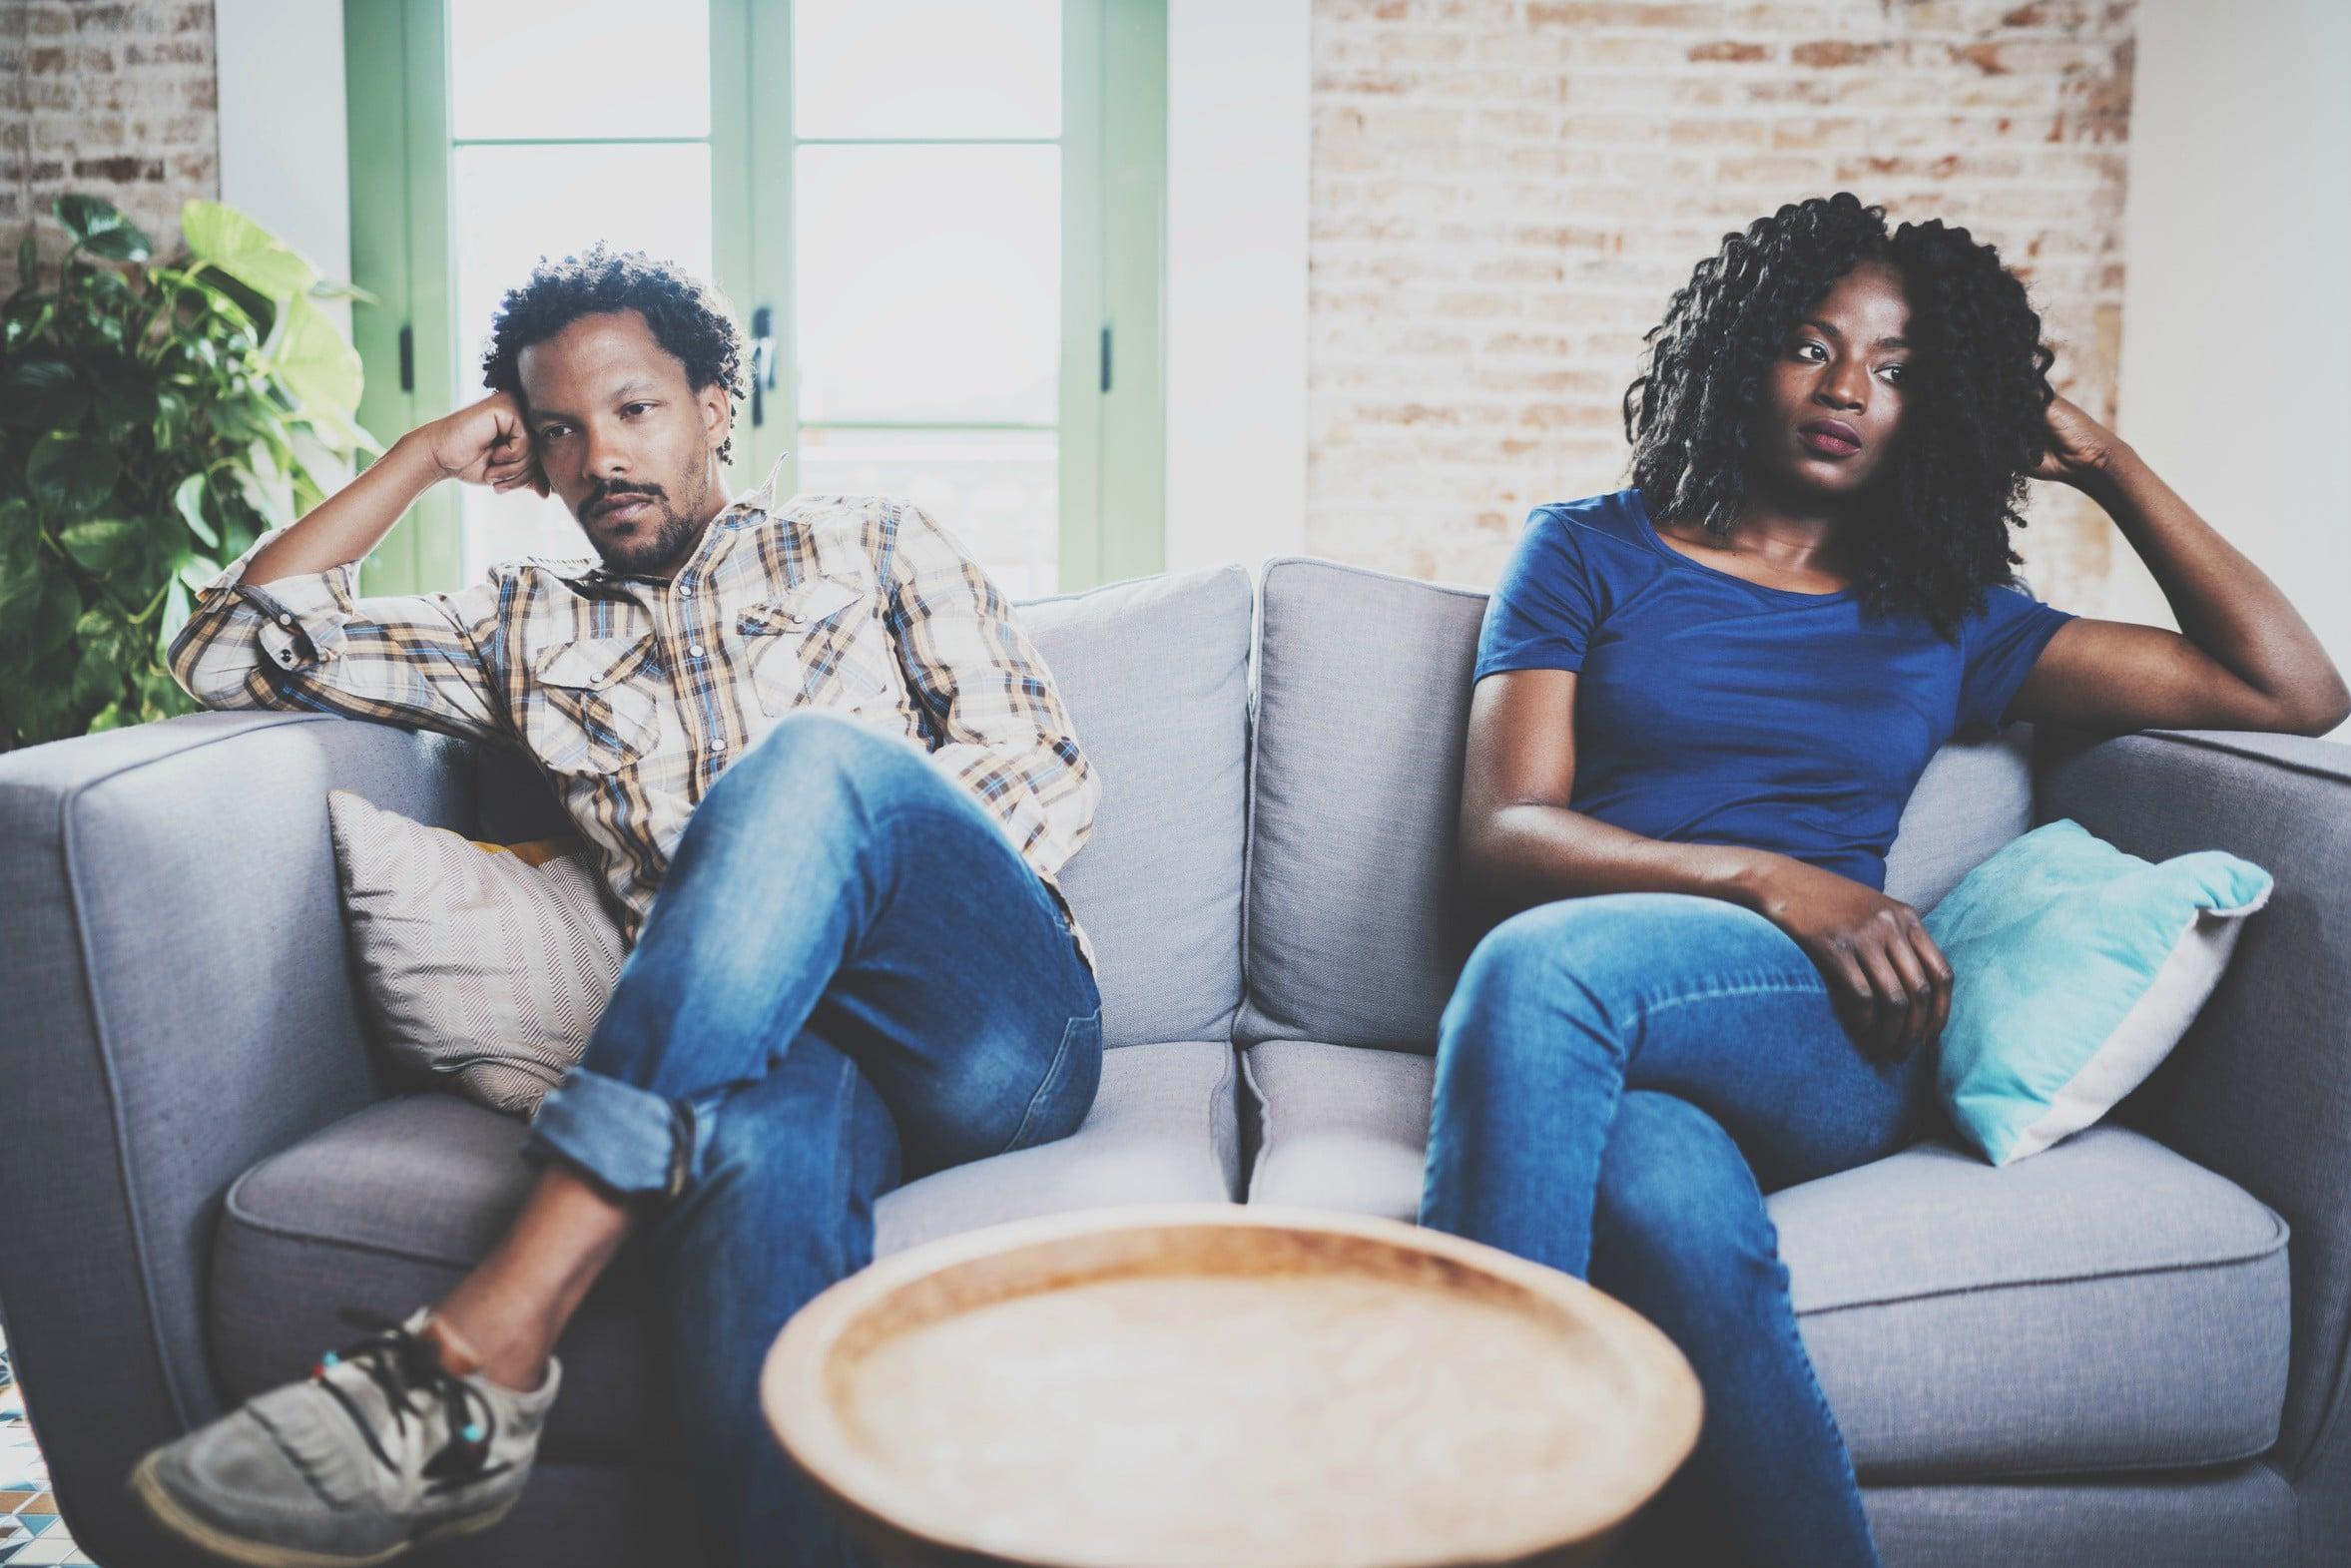 14651b99fa Study claims Black men hold Black women back, but seems like salt in ...